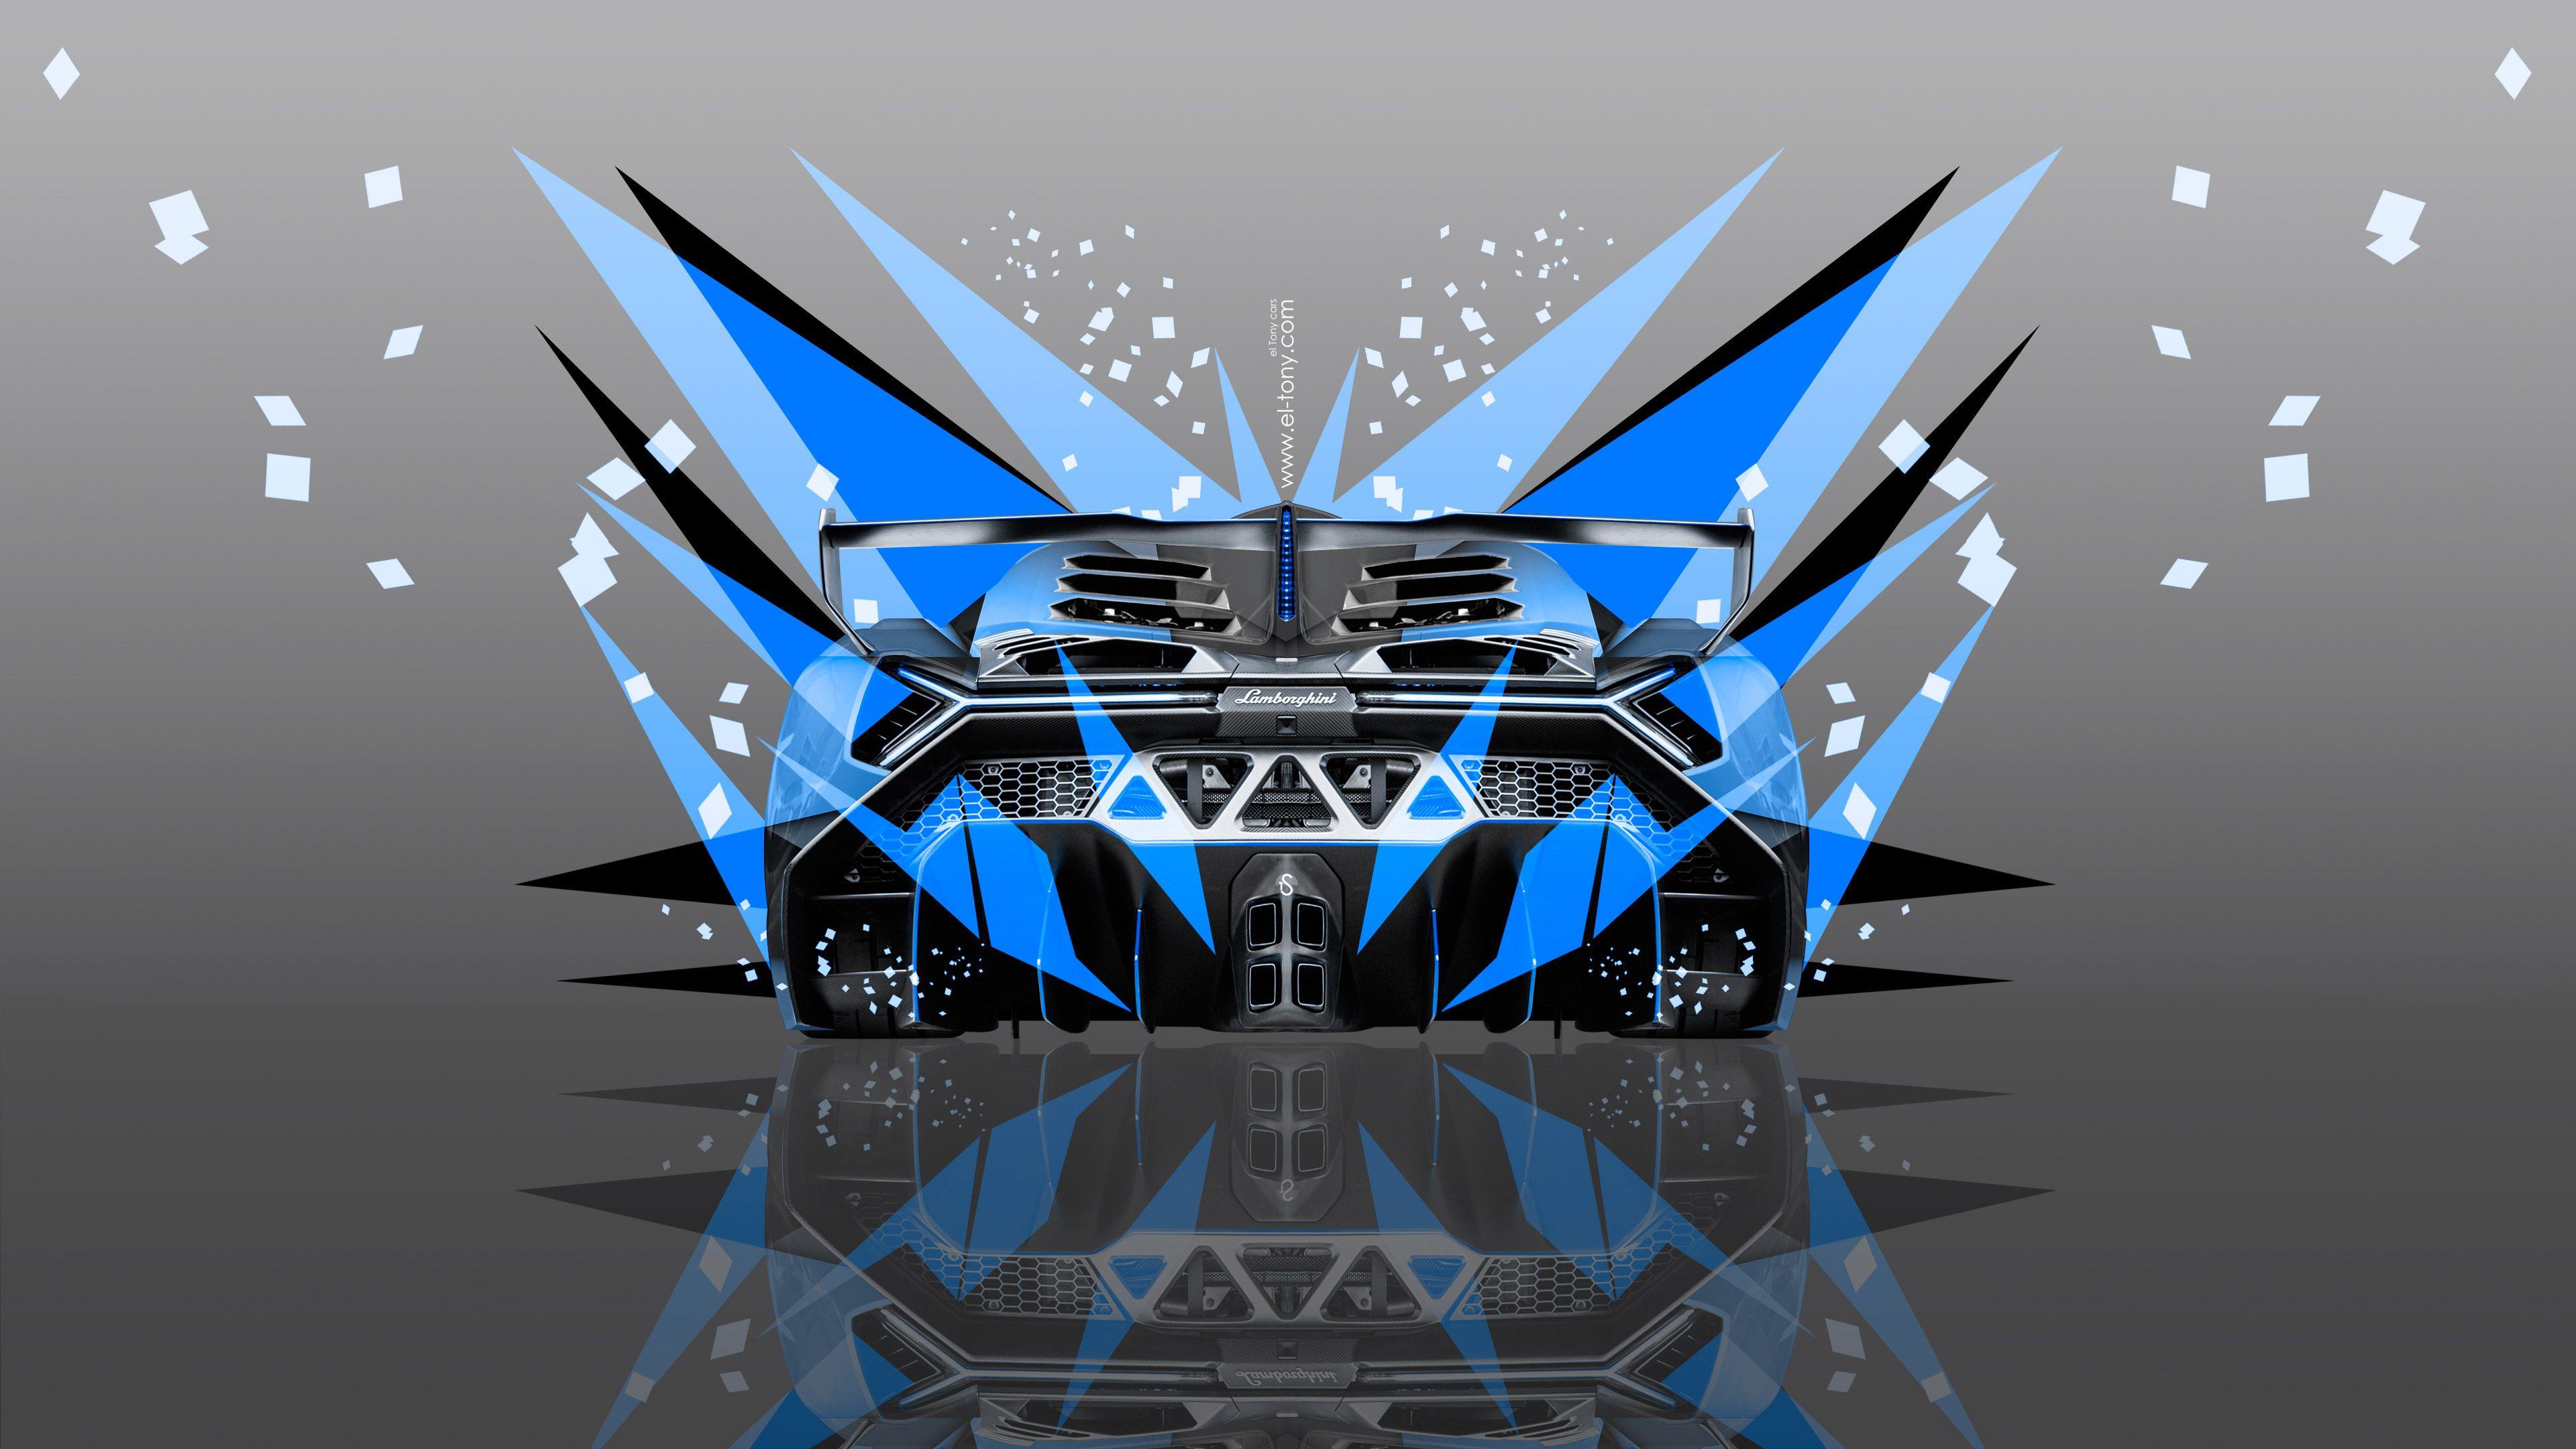 lamborghini veneno back abstract transformer car 2014 blue